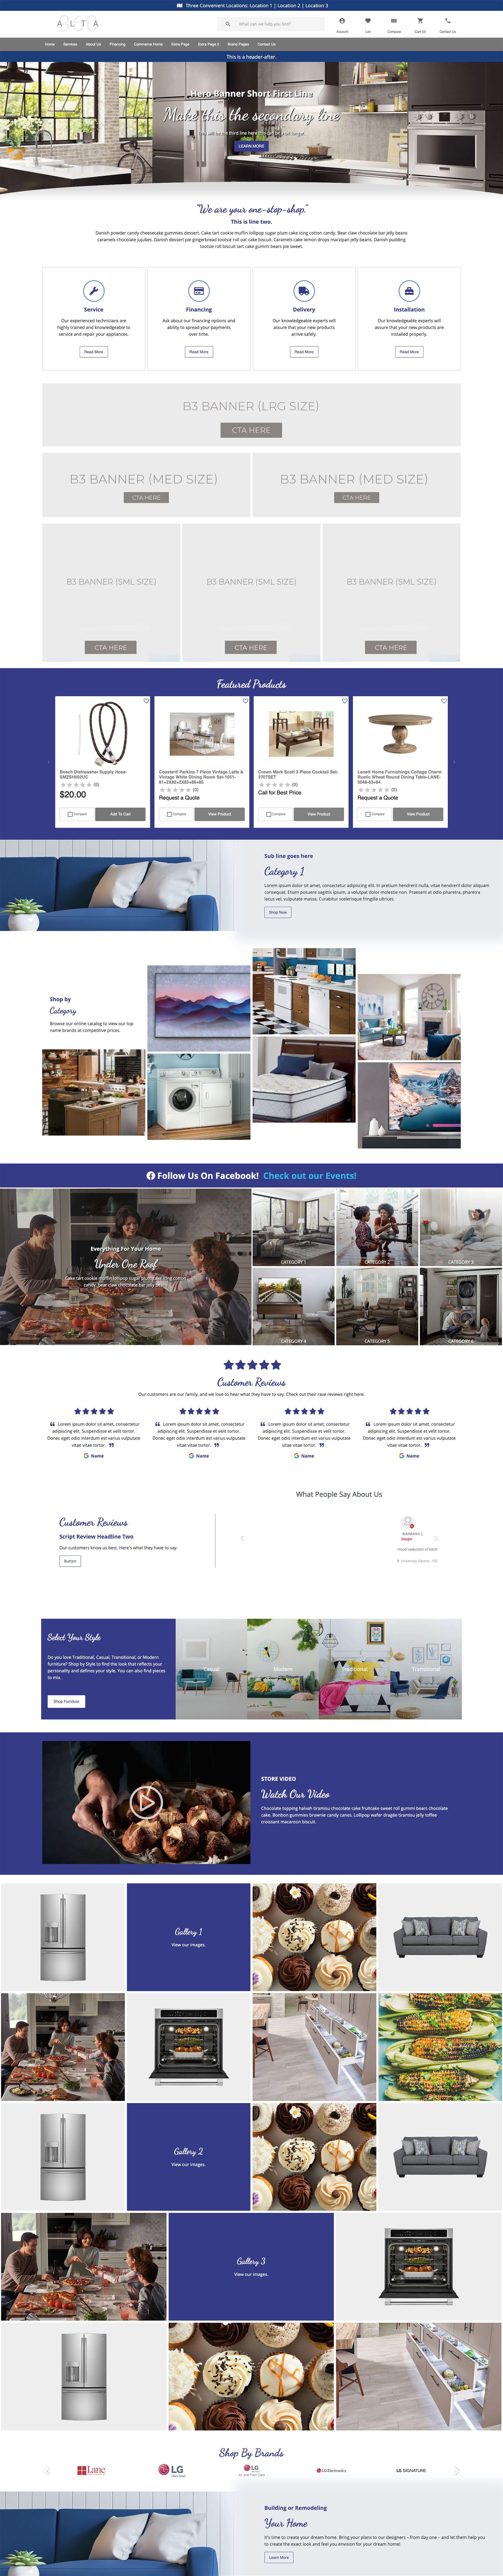 Website Themes - Commerce - Masonry